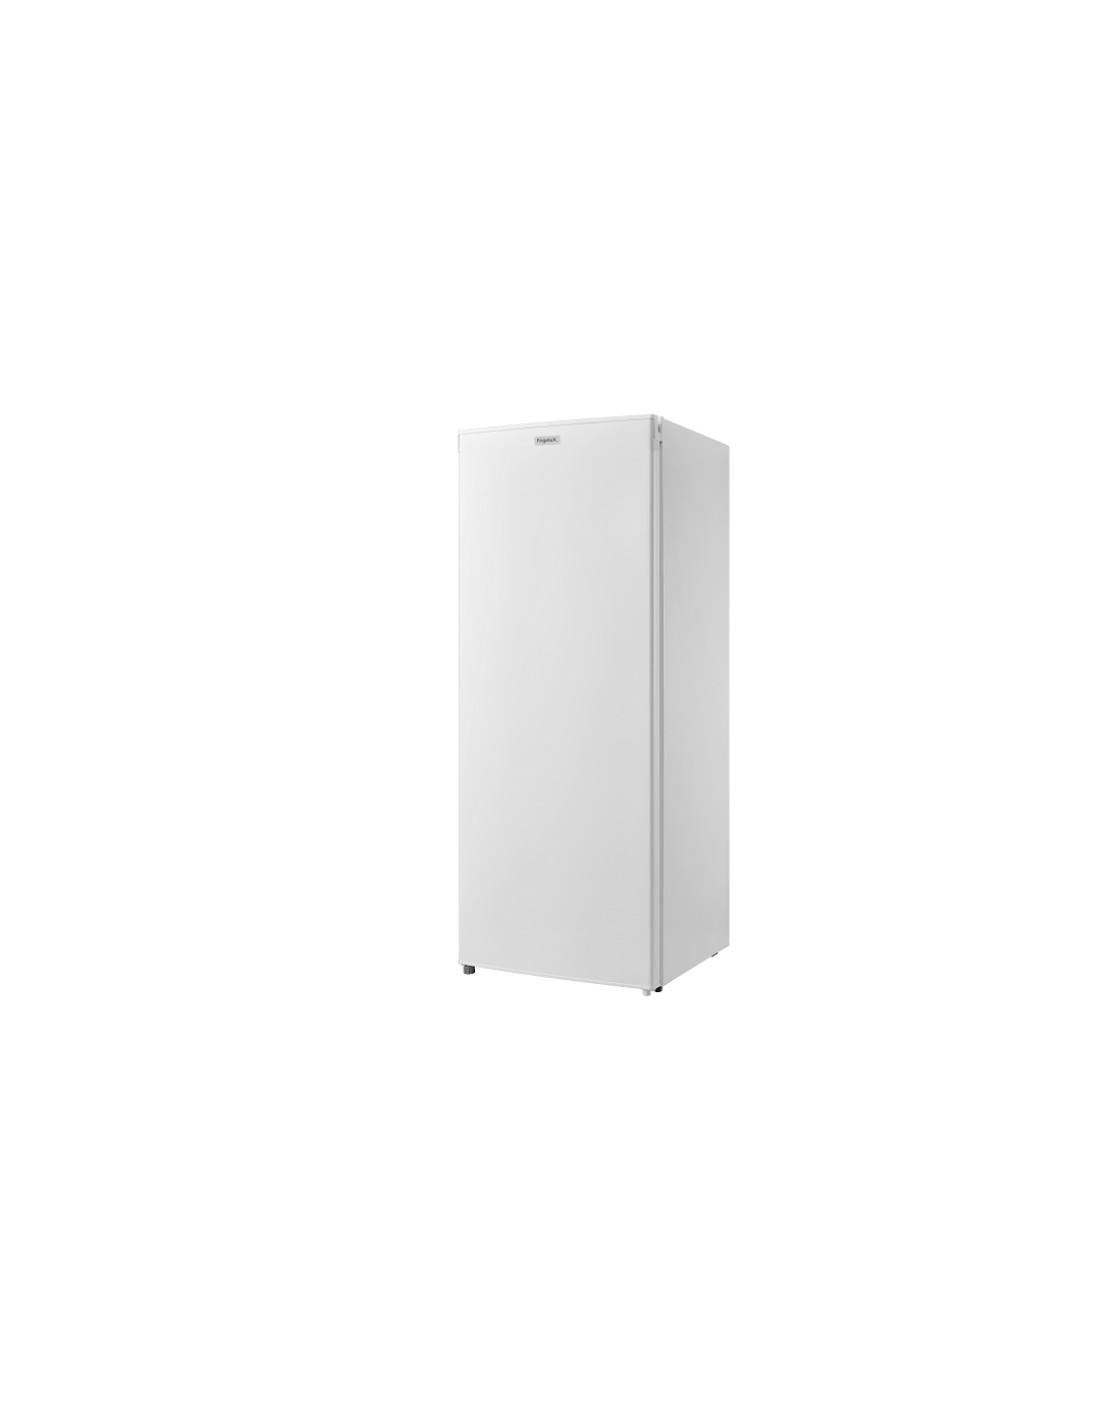 http://www.promo-electro.fr/2472-thickbox_default/congelateur-coffre-blanc-98l-frigelux-cv100a.jpg